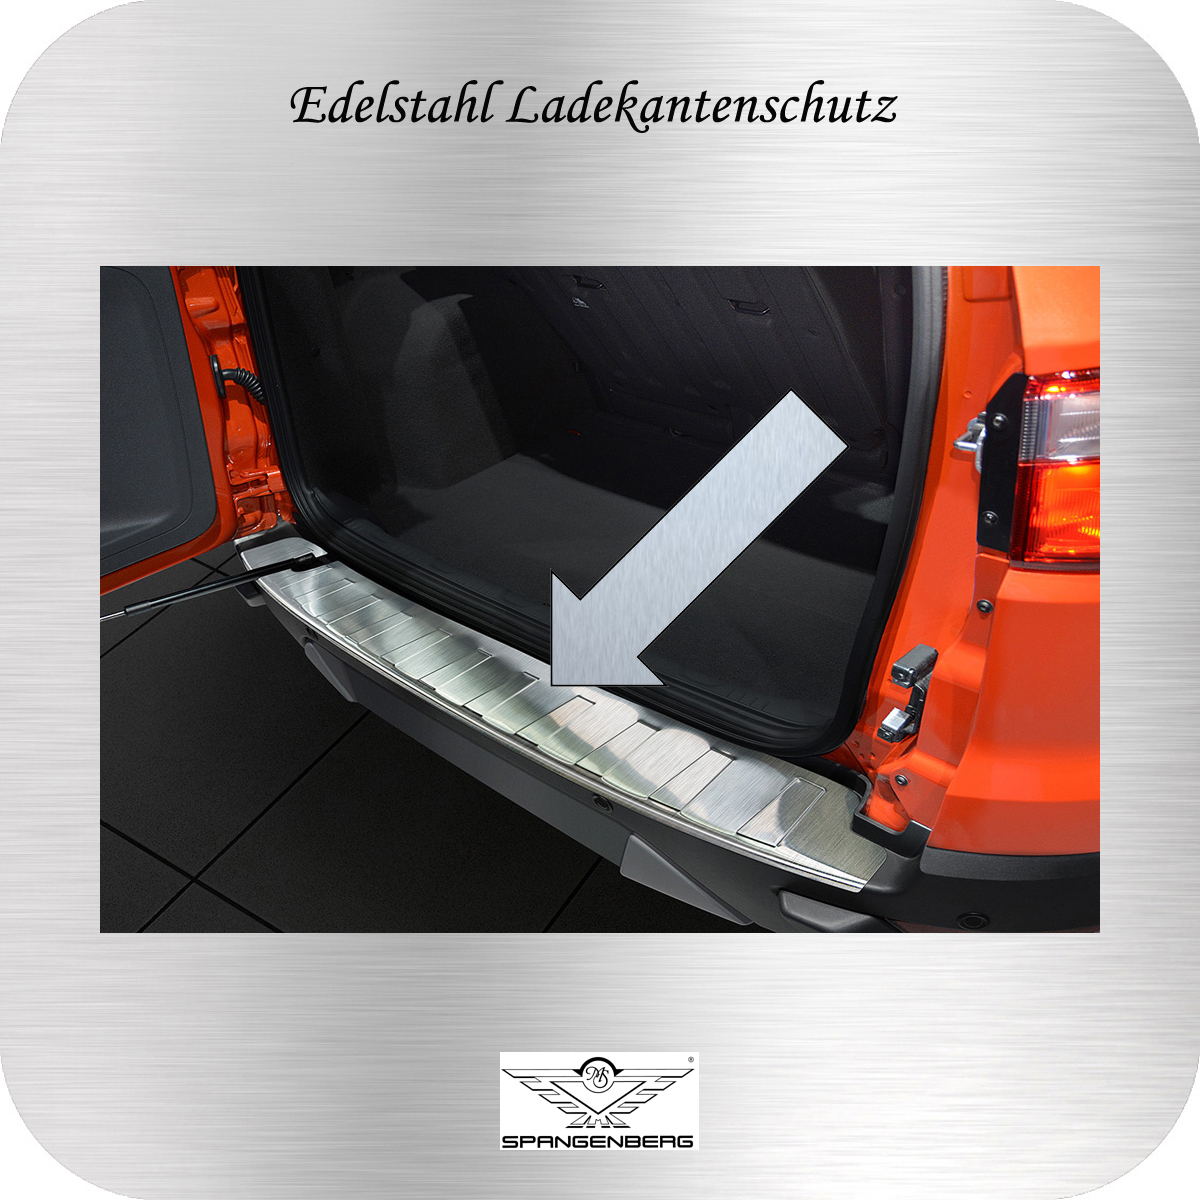 Ladekantenschutz Edelstahl Ford Ecosport II SUV Kombi vor Mopf 2012-17 3235698